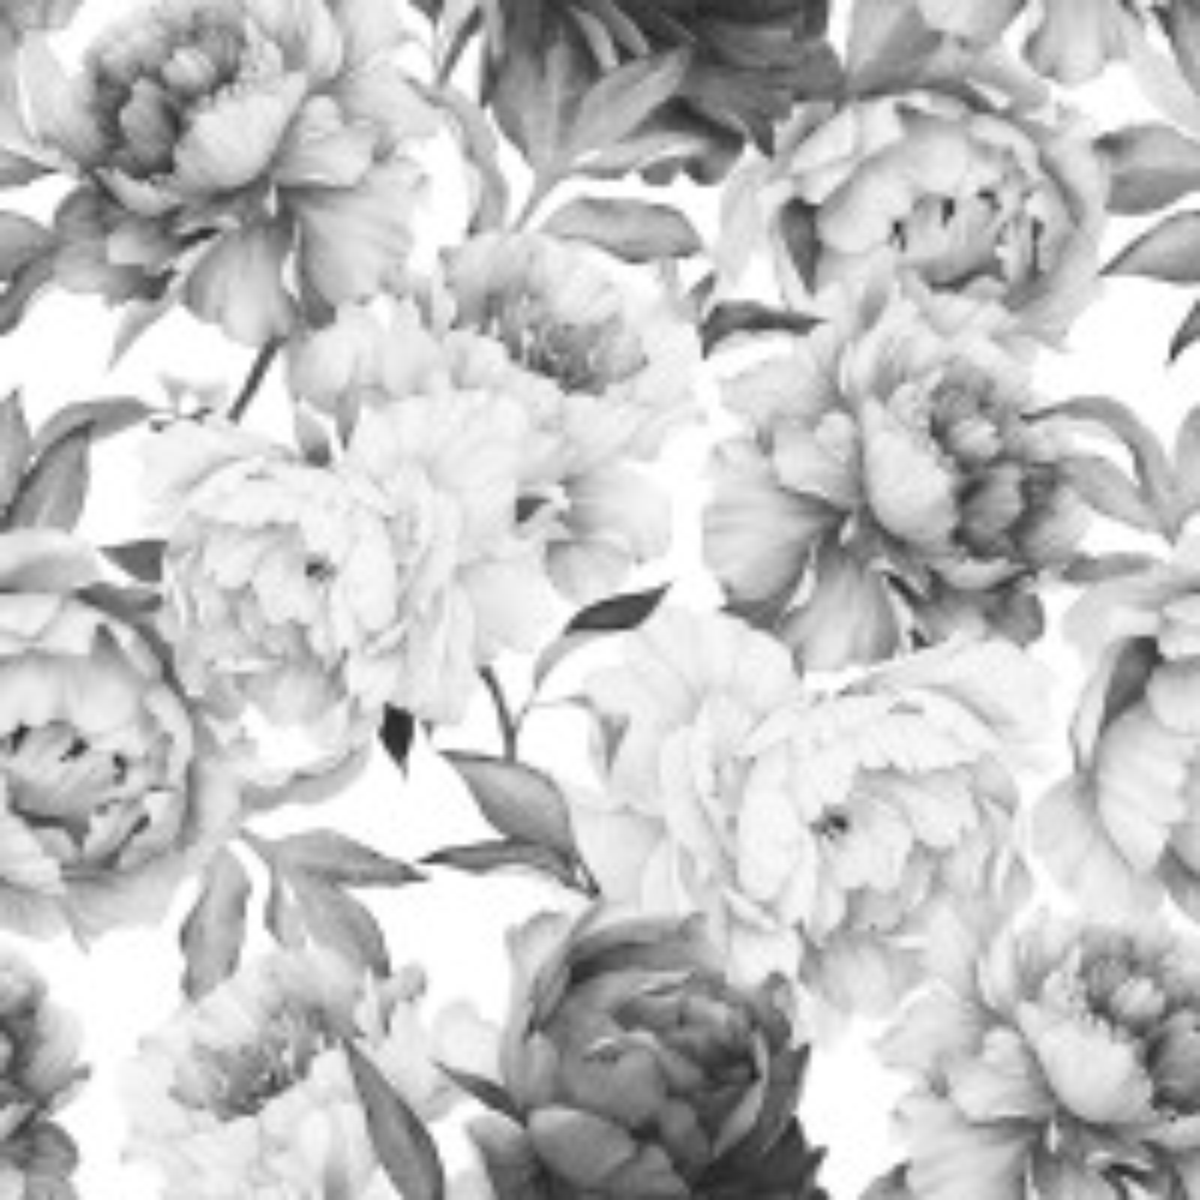 Dark Floral Charcoal Rose Flower Wallpaper Mural